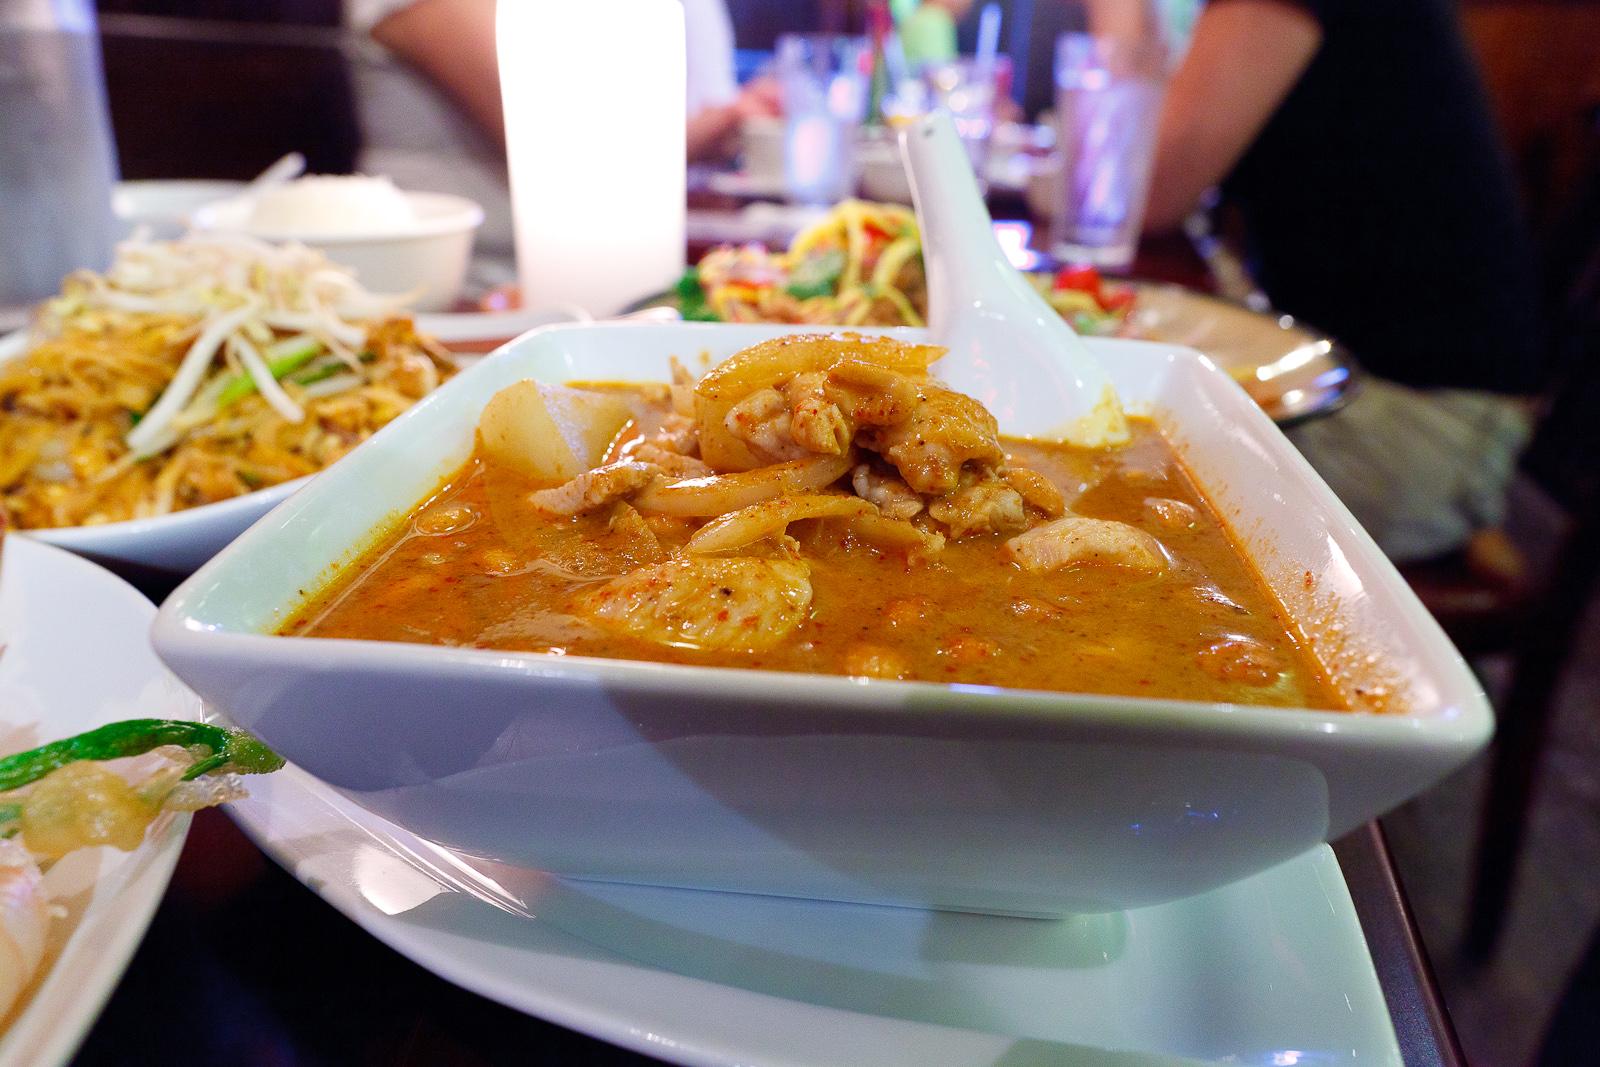 Massaman curry with chicken, onion, potato, and peanut in coconut milk ($9)